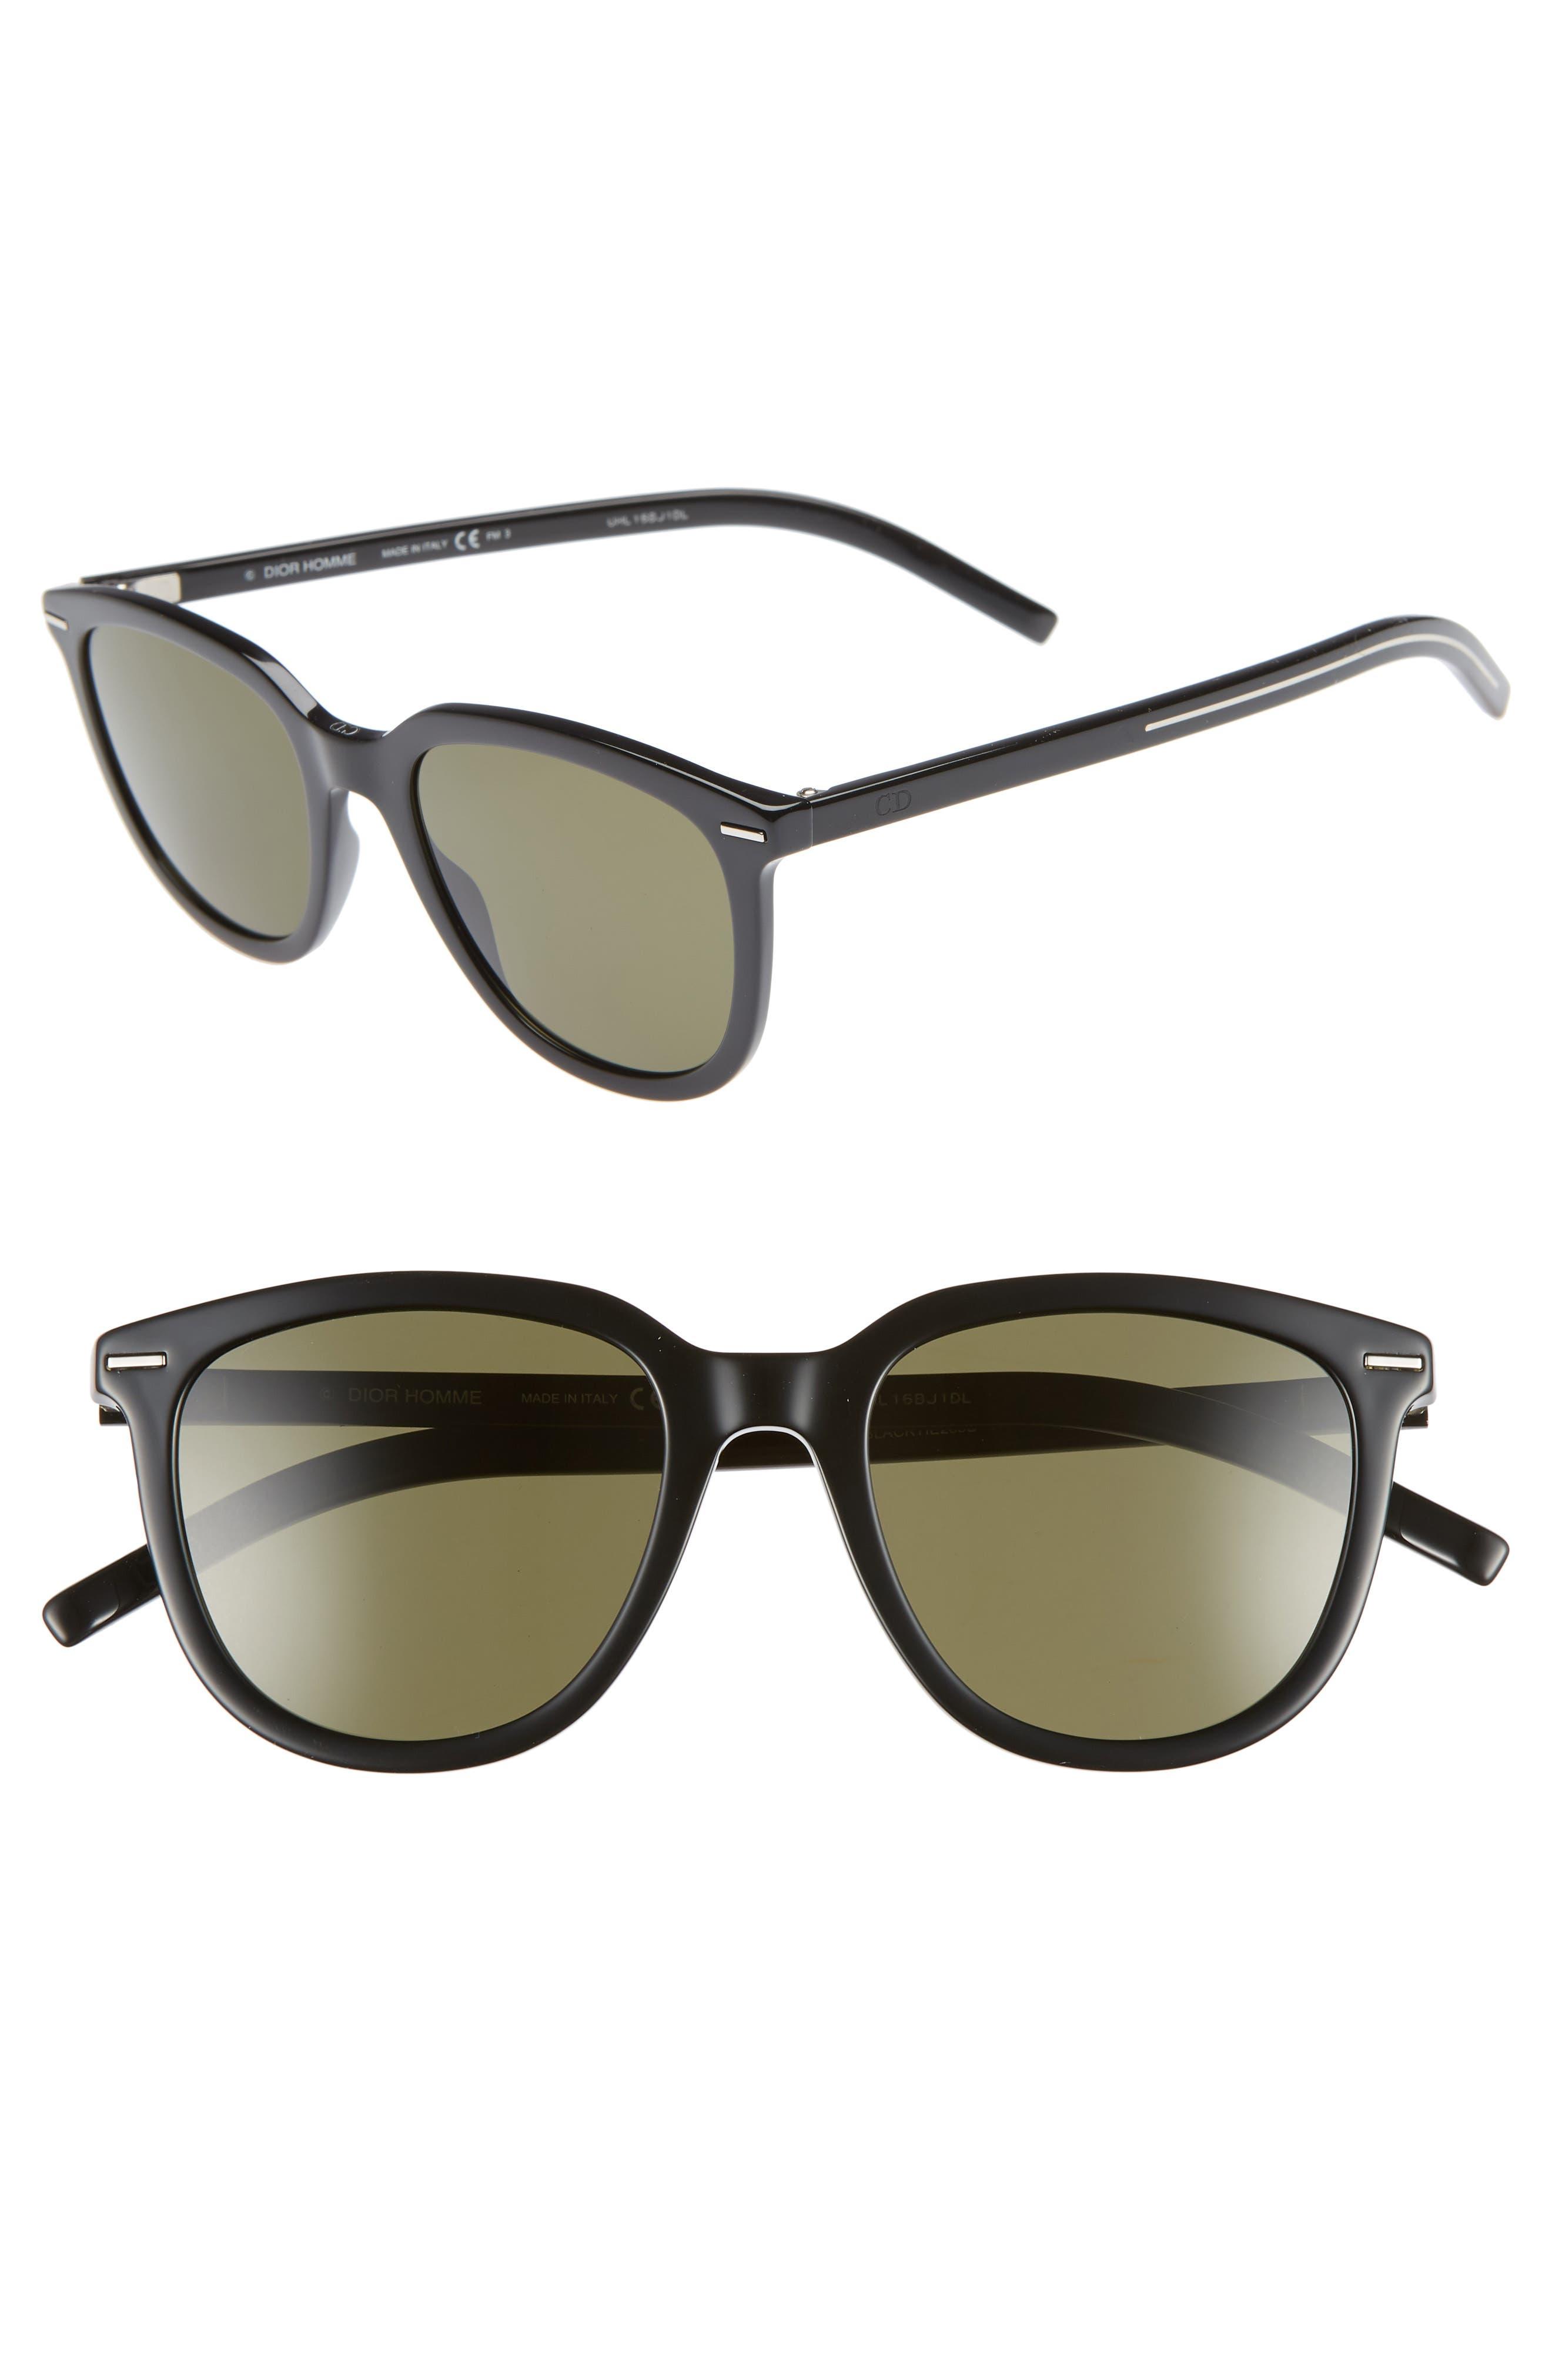 51mm Sunglasses,                             Main thumbnail 1, color,                             BLACK